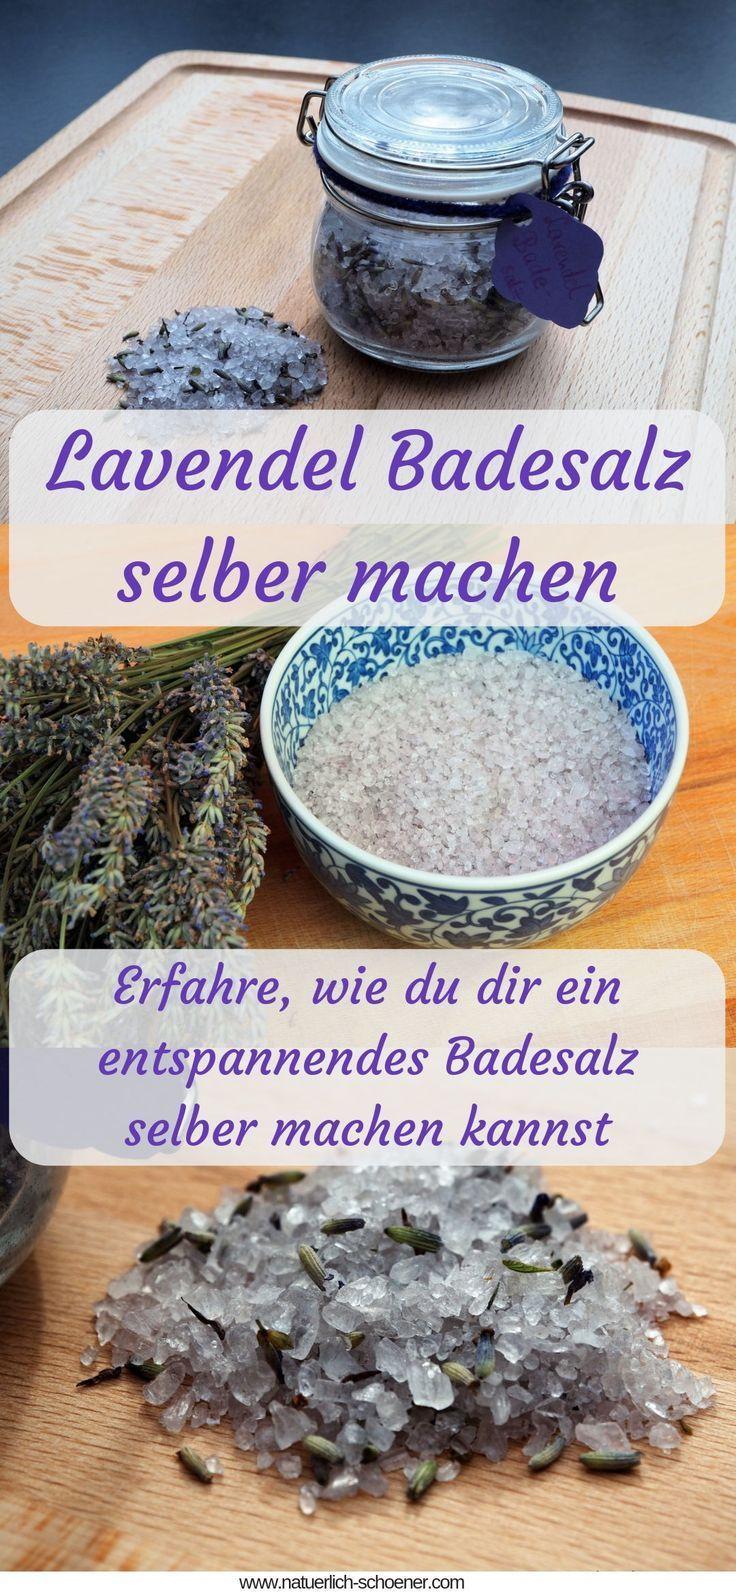 Lavendel Badesalz selber machen #badesalzselbermachen